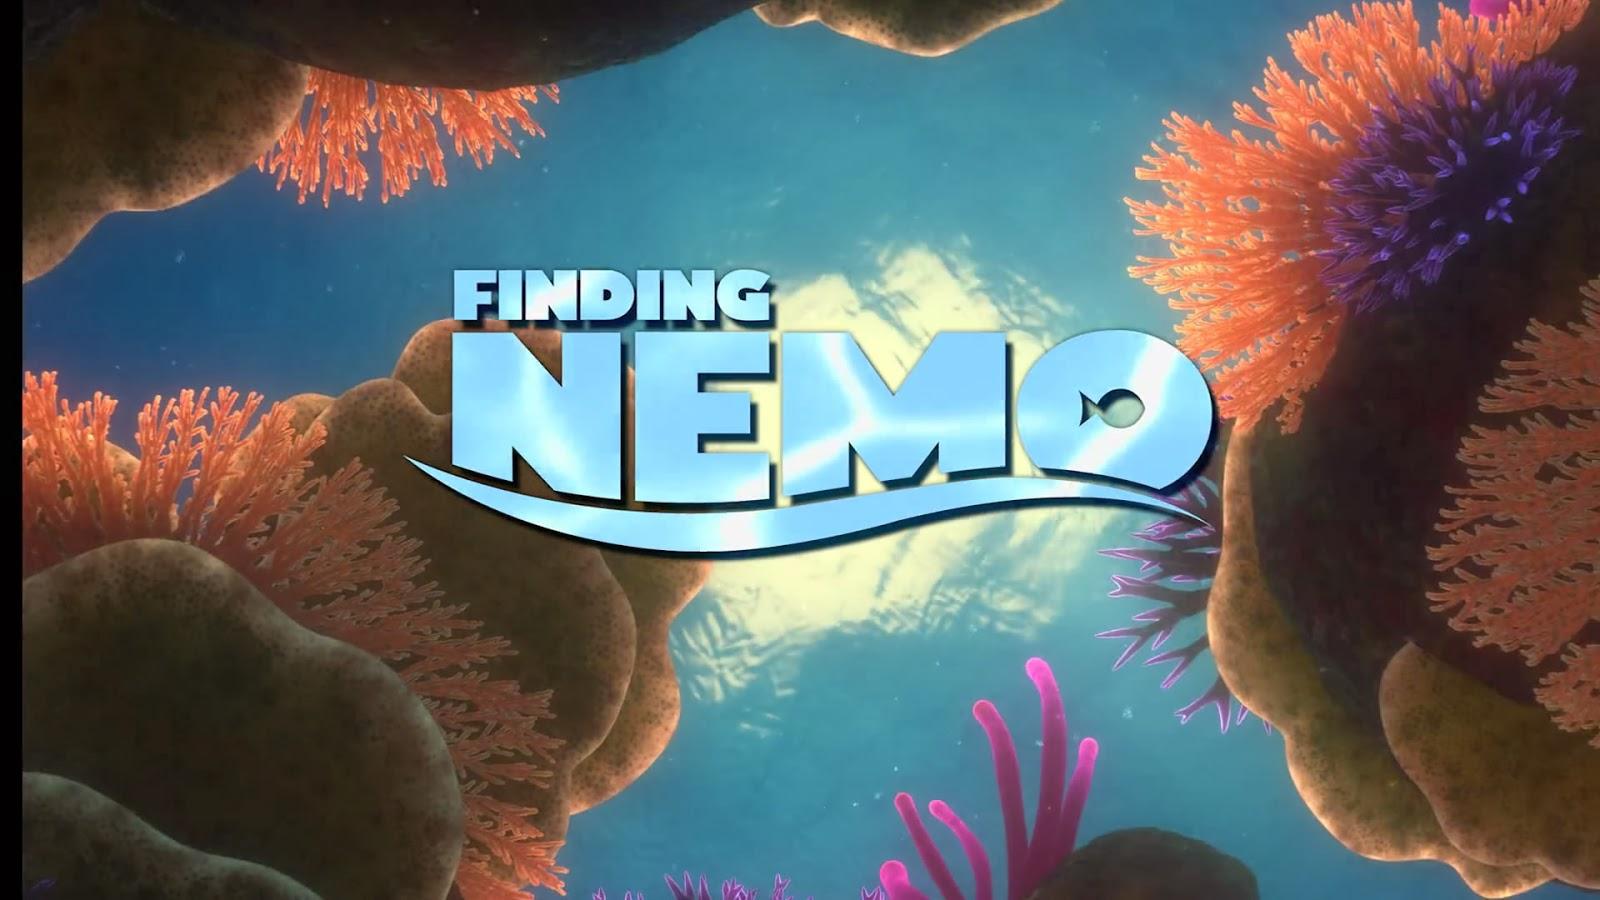 Finding Nemo (2003) S2 s Finding Nemo (2003)